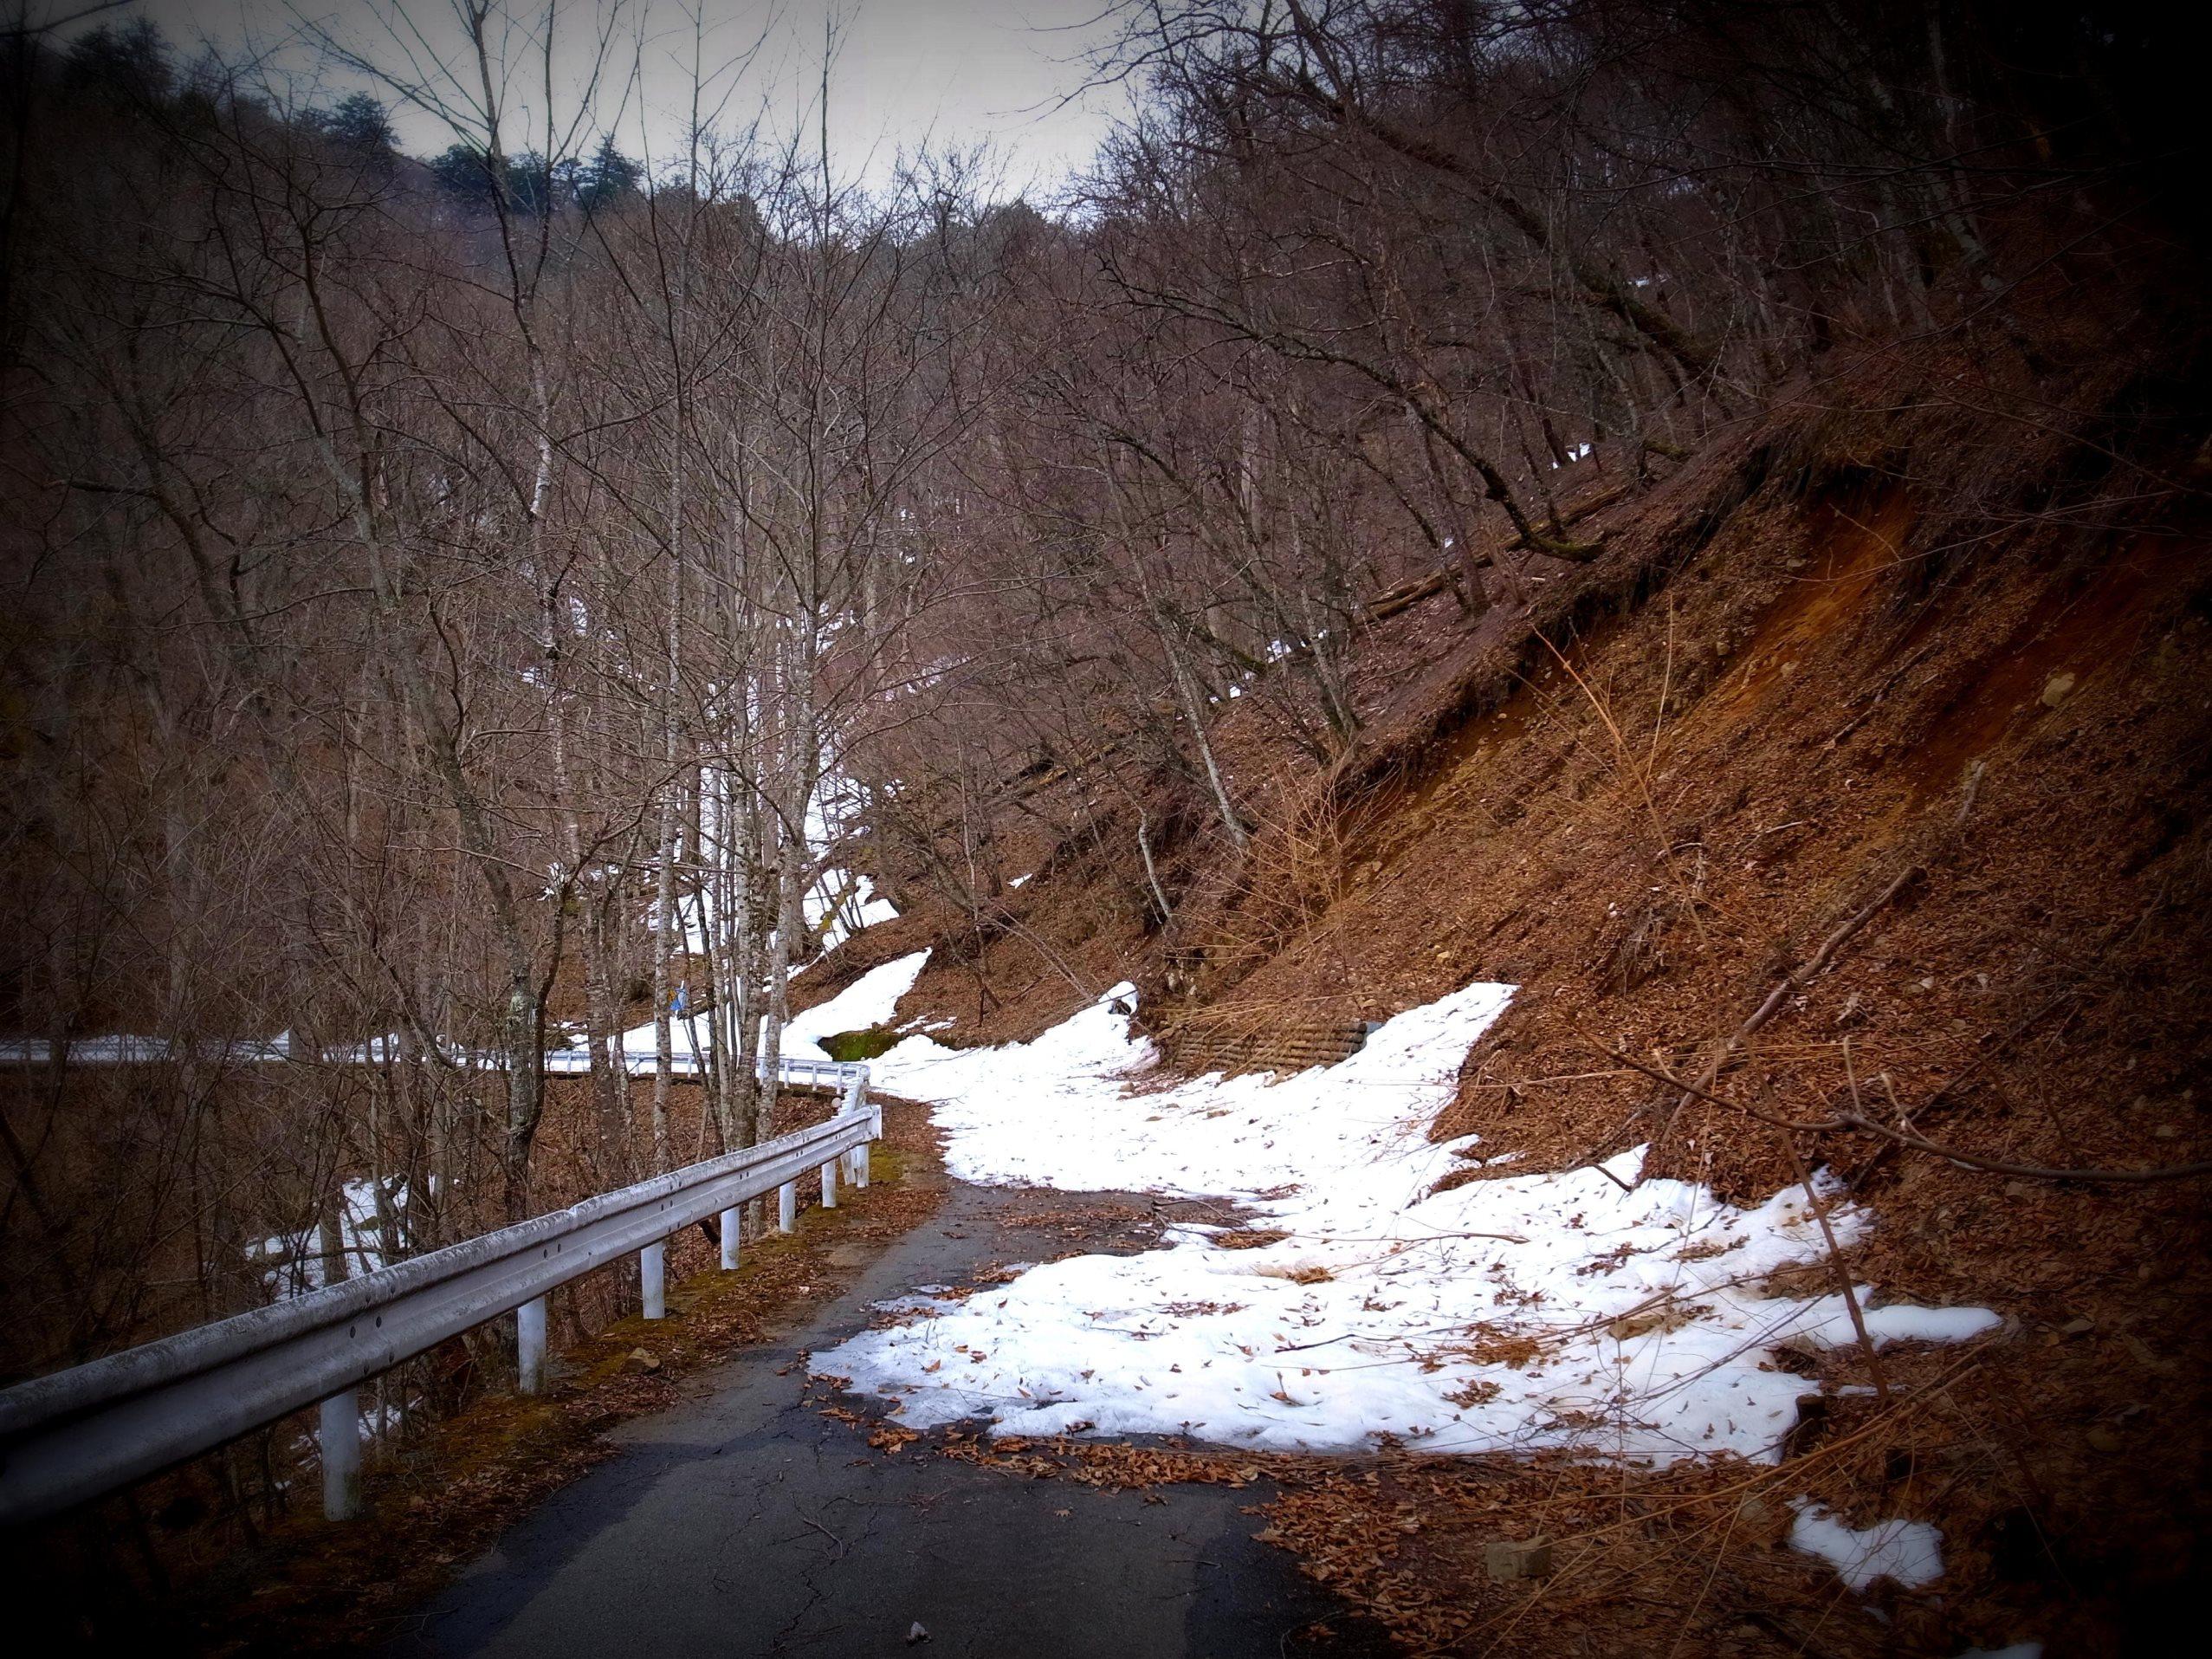 Devastated Road in Yamanashi Pref.